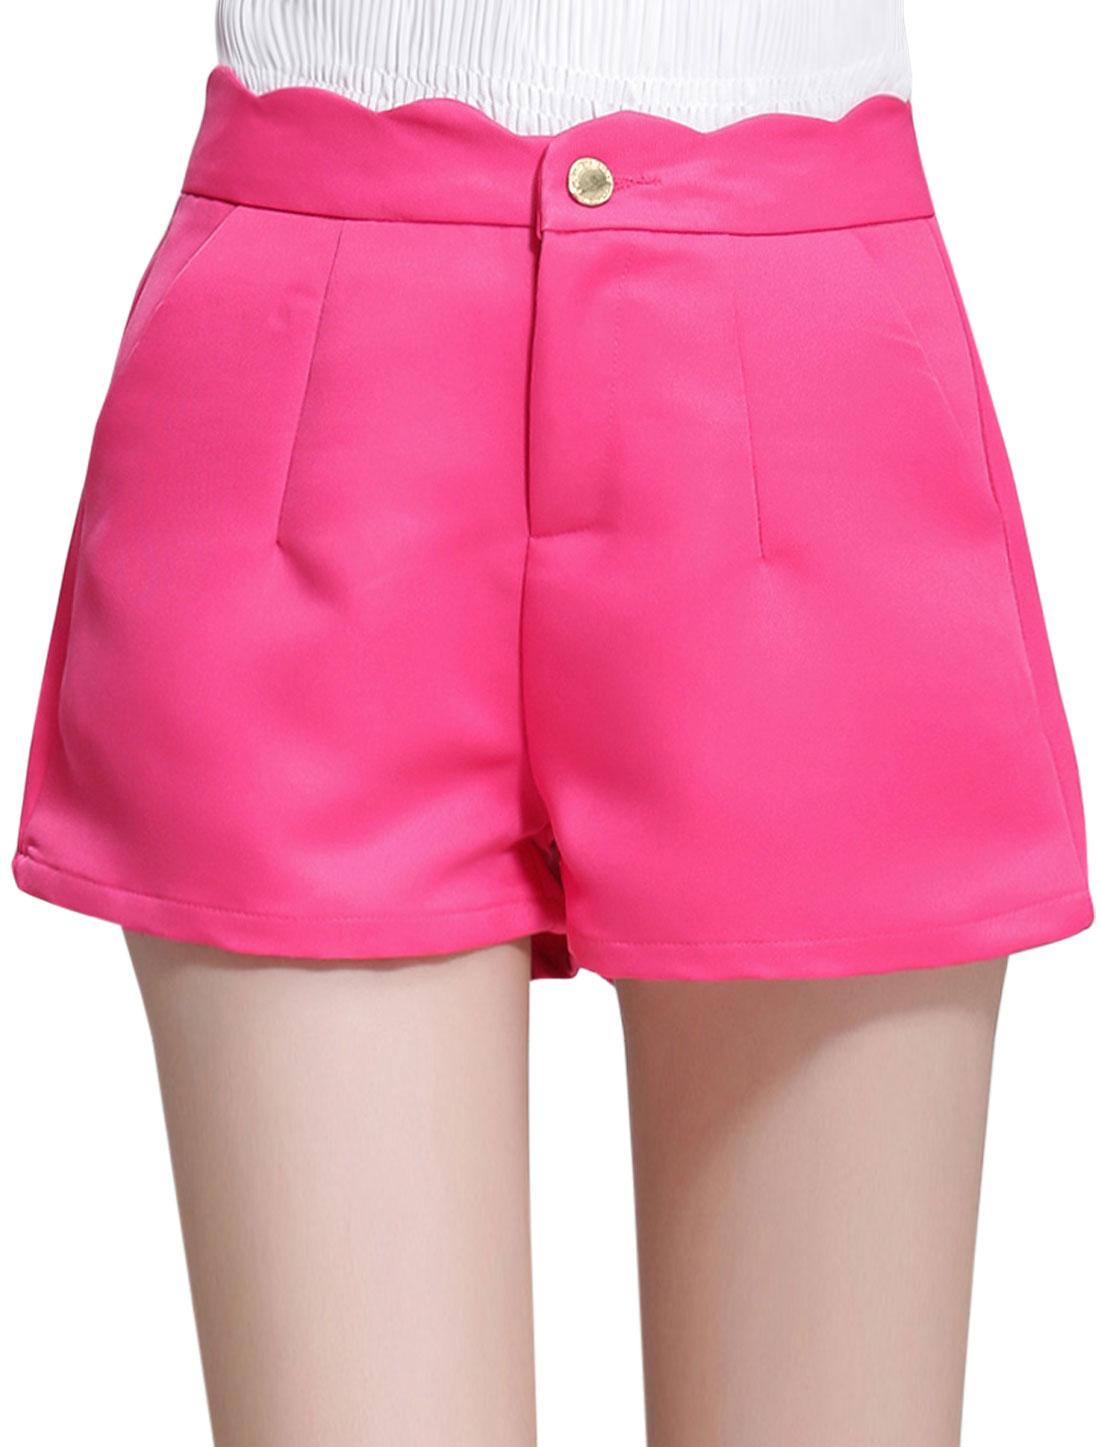 Women High Waist Two Mock Pockets Back Short Pants Fuchsia L